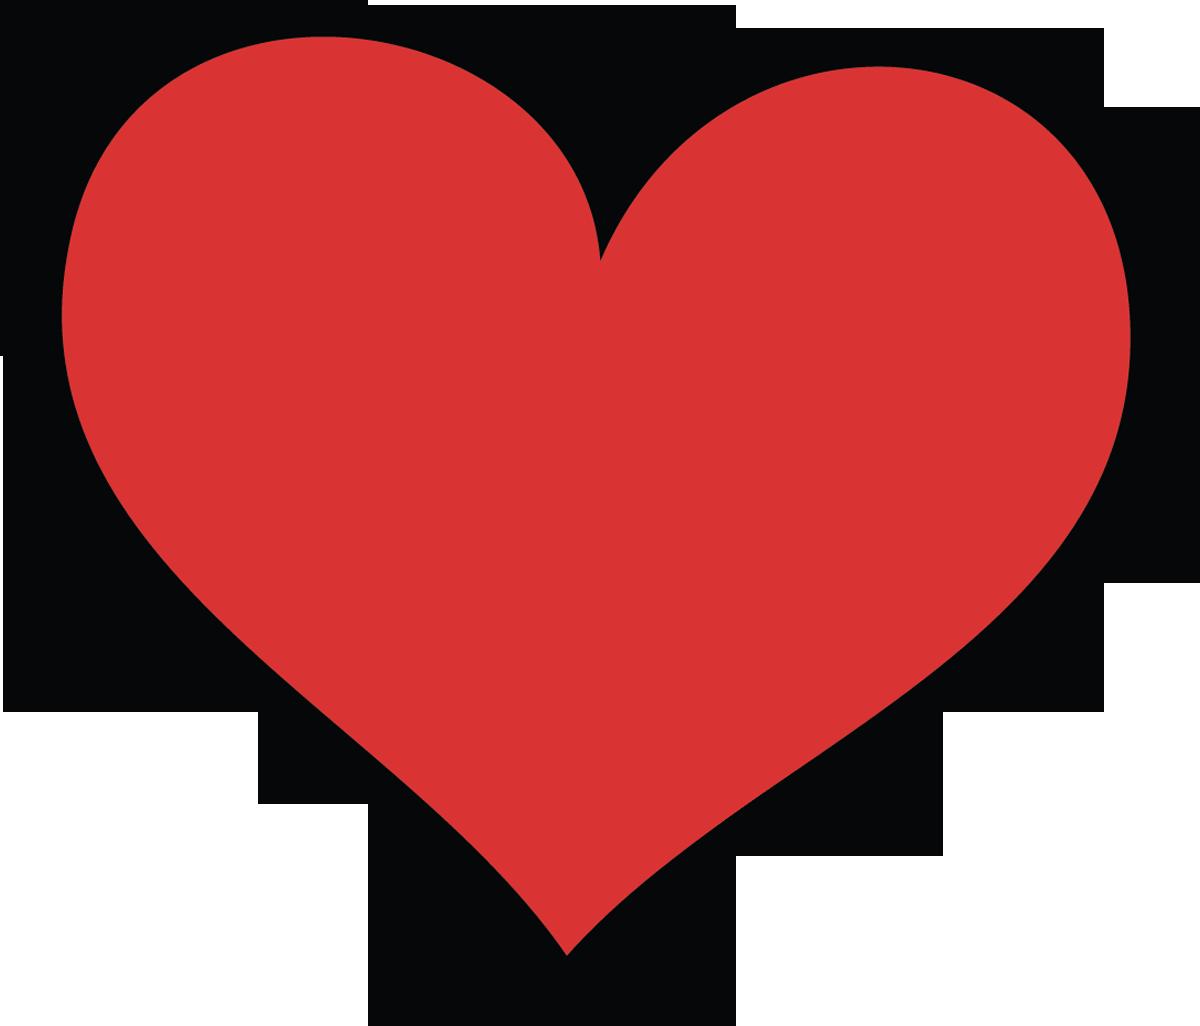 Clipart Love Heart Buncee Clipart Hearts 08.